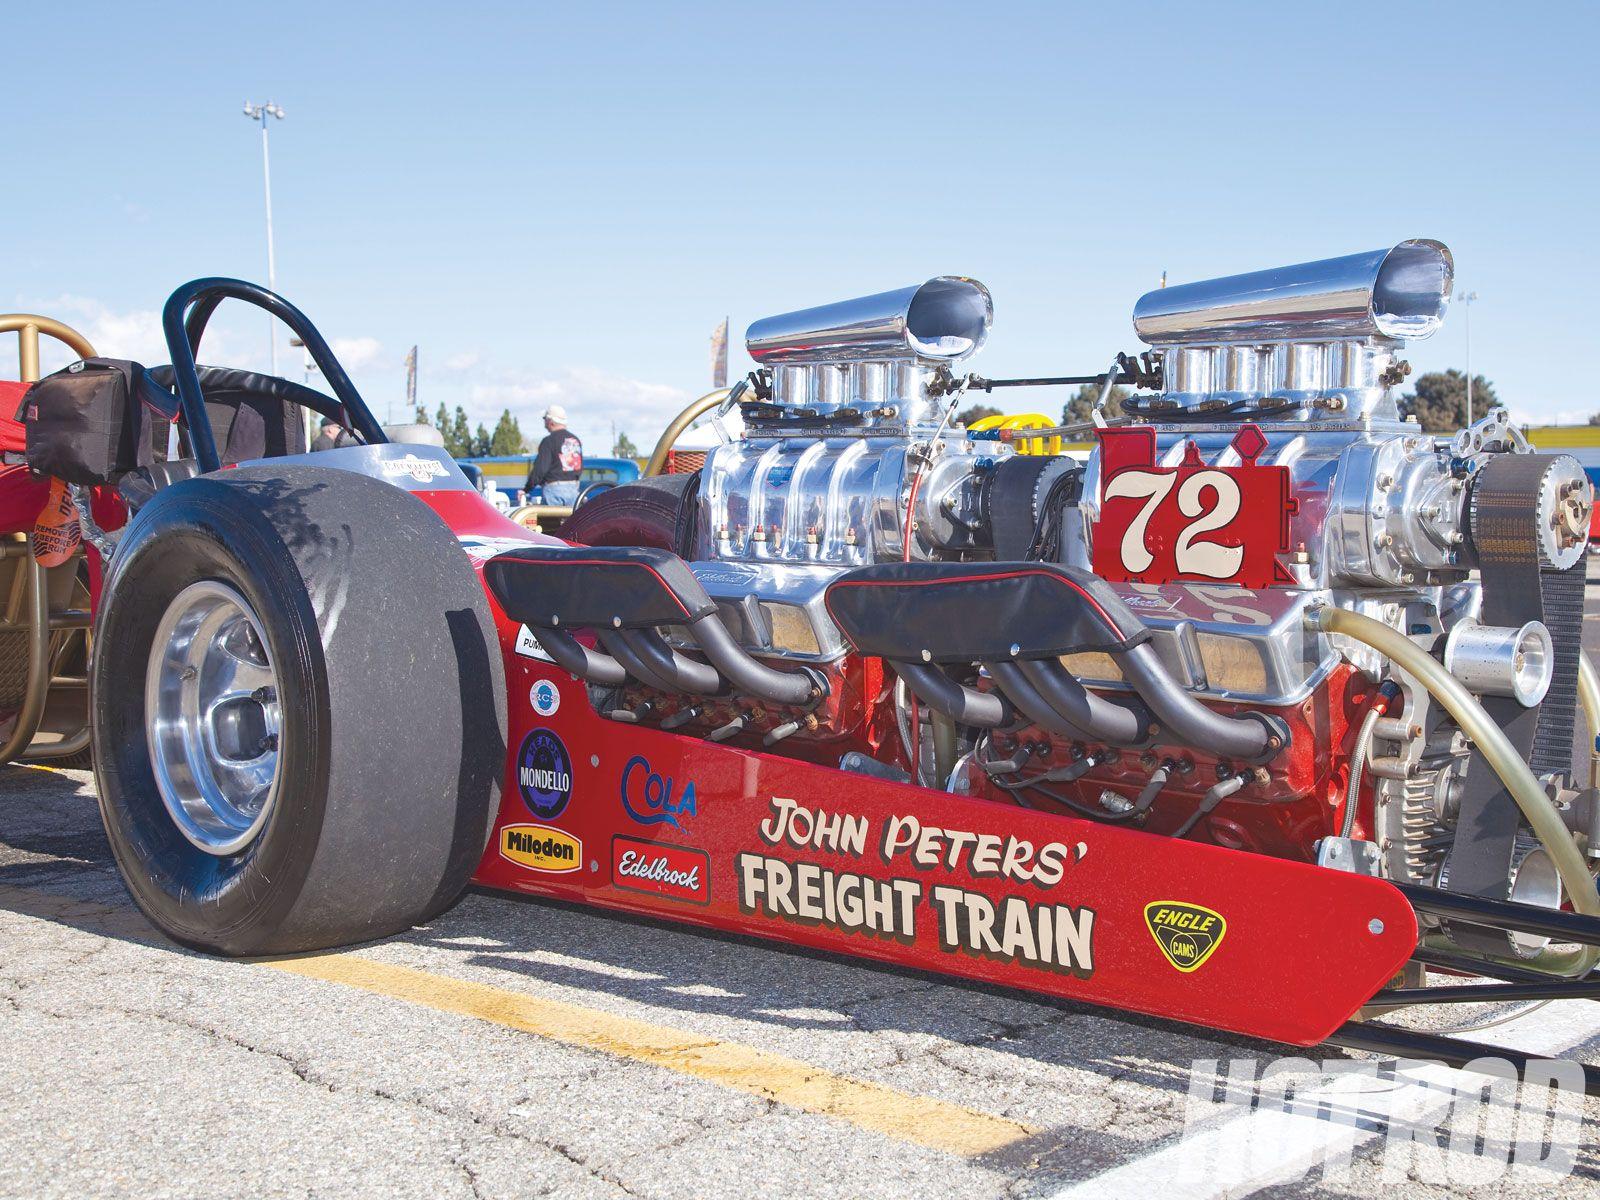 medium resolution of freight train twin engine top fuel